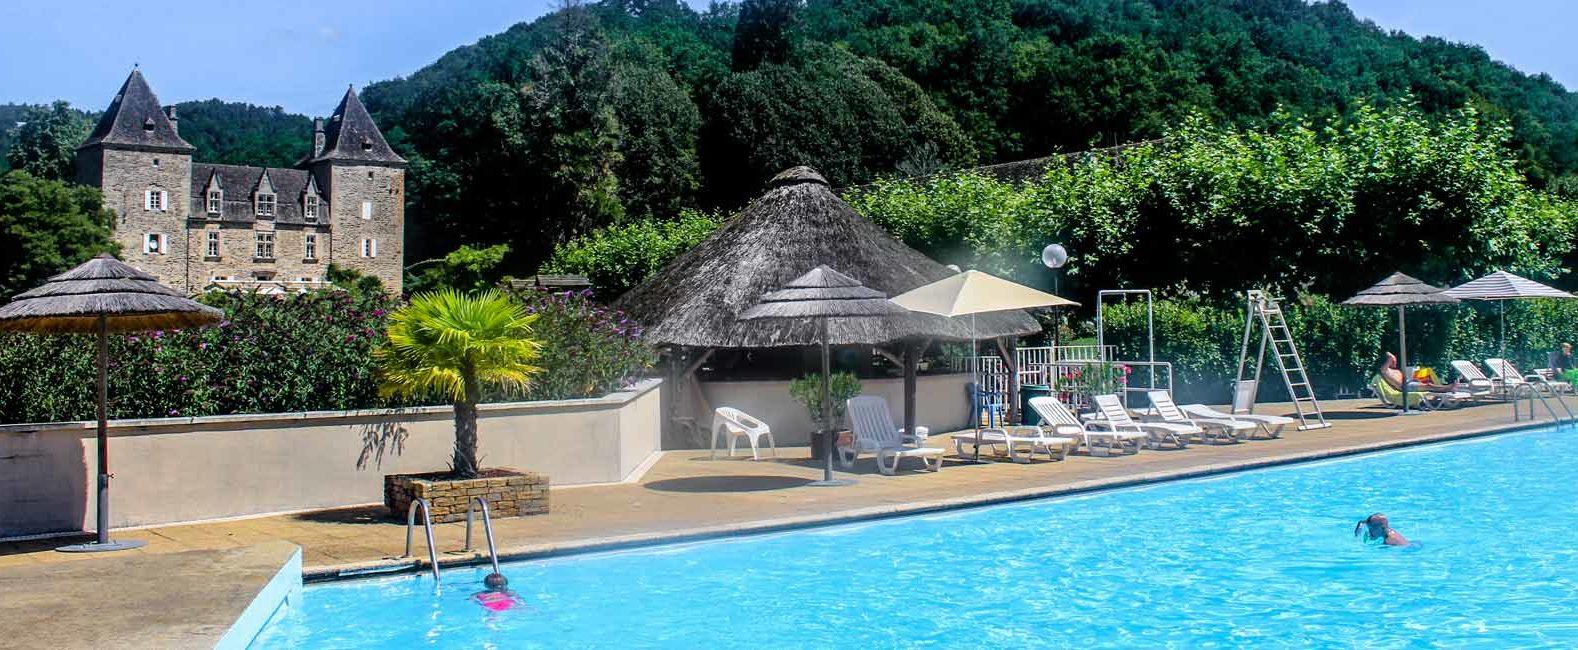 camping avec piscine Correze